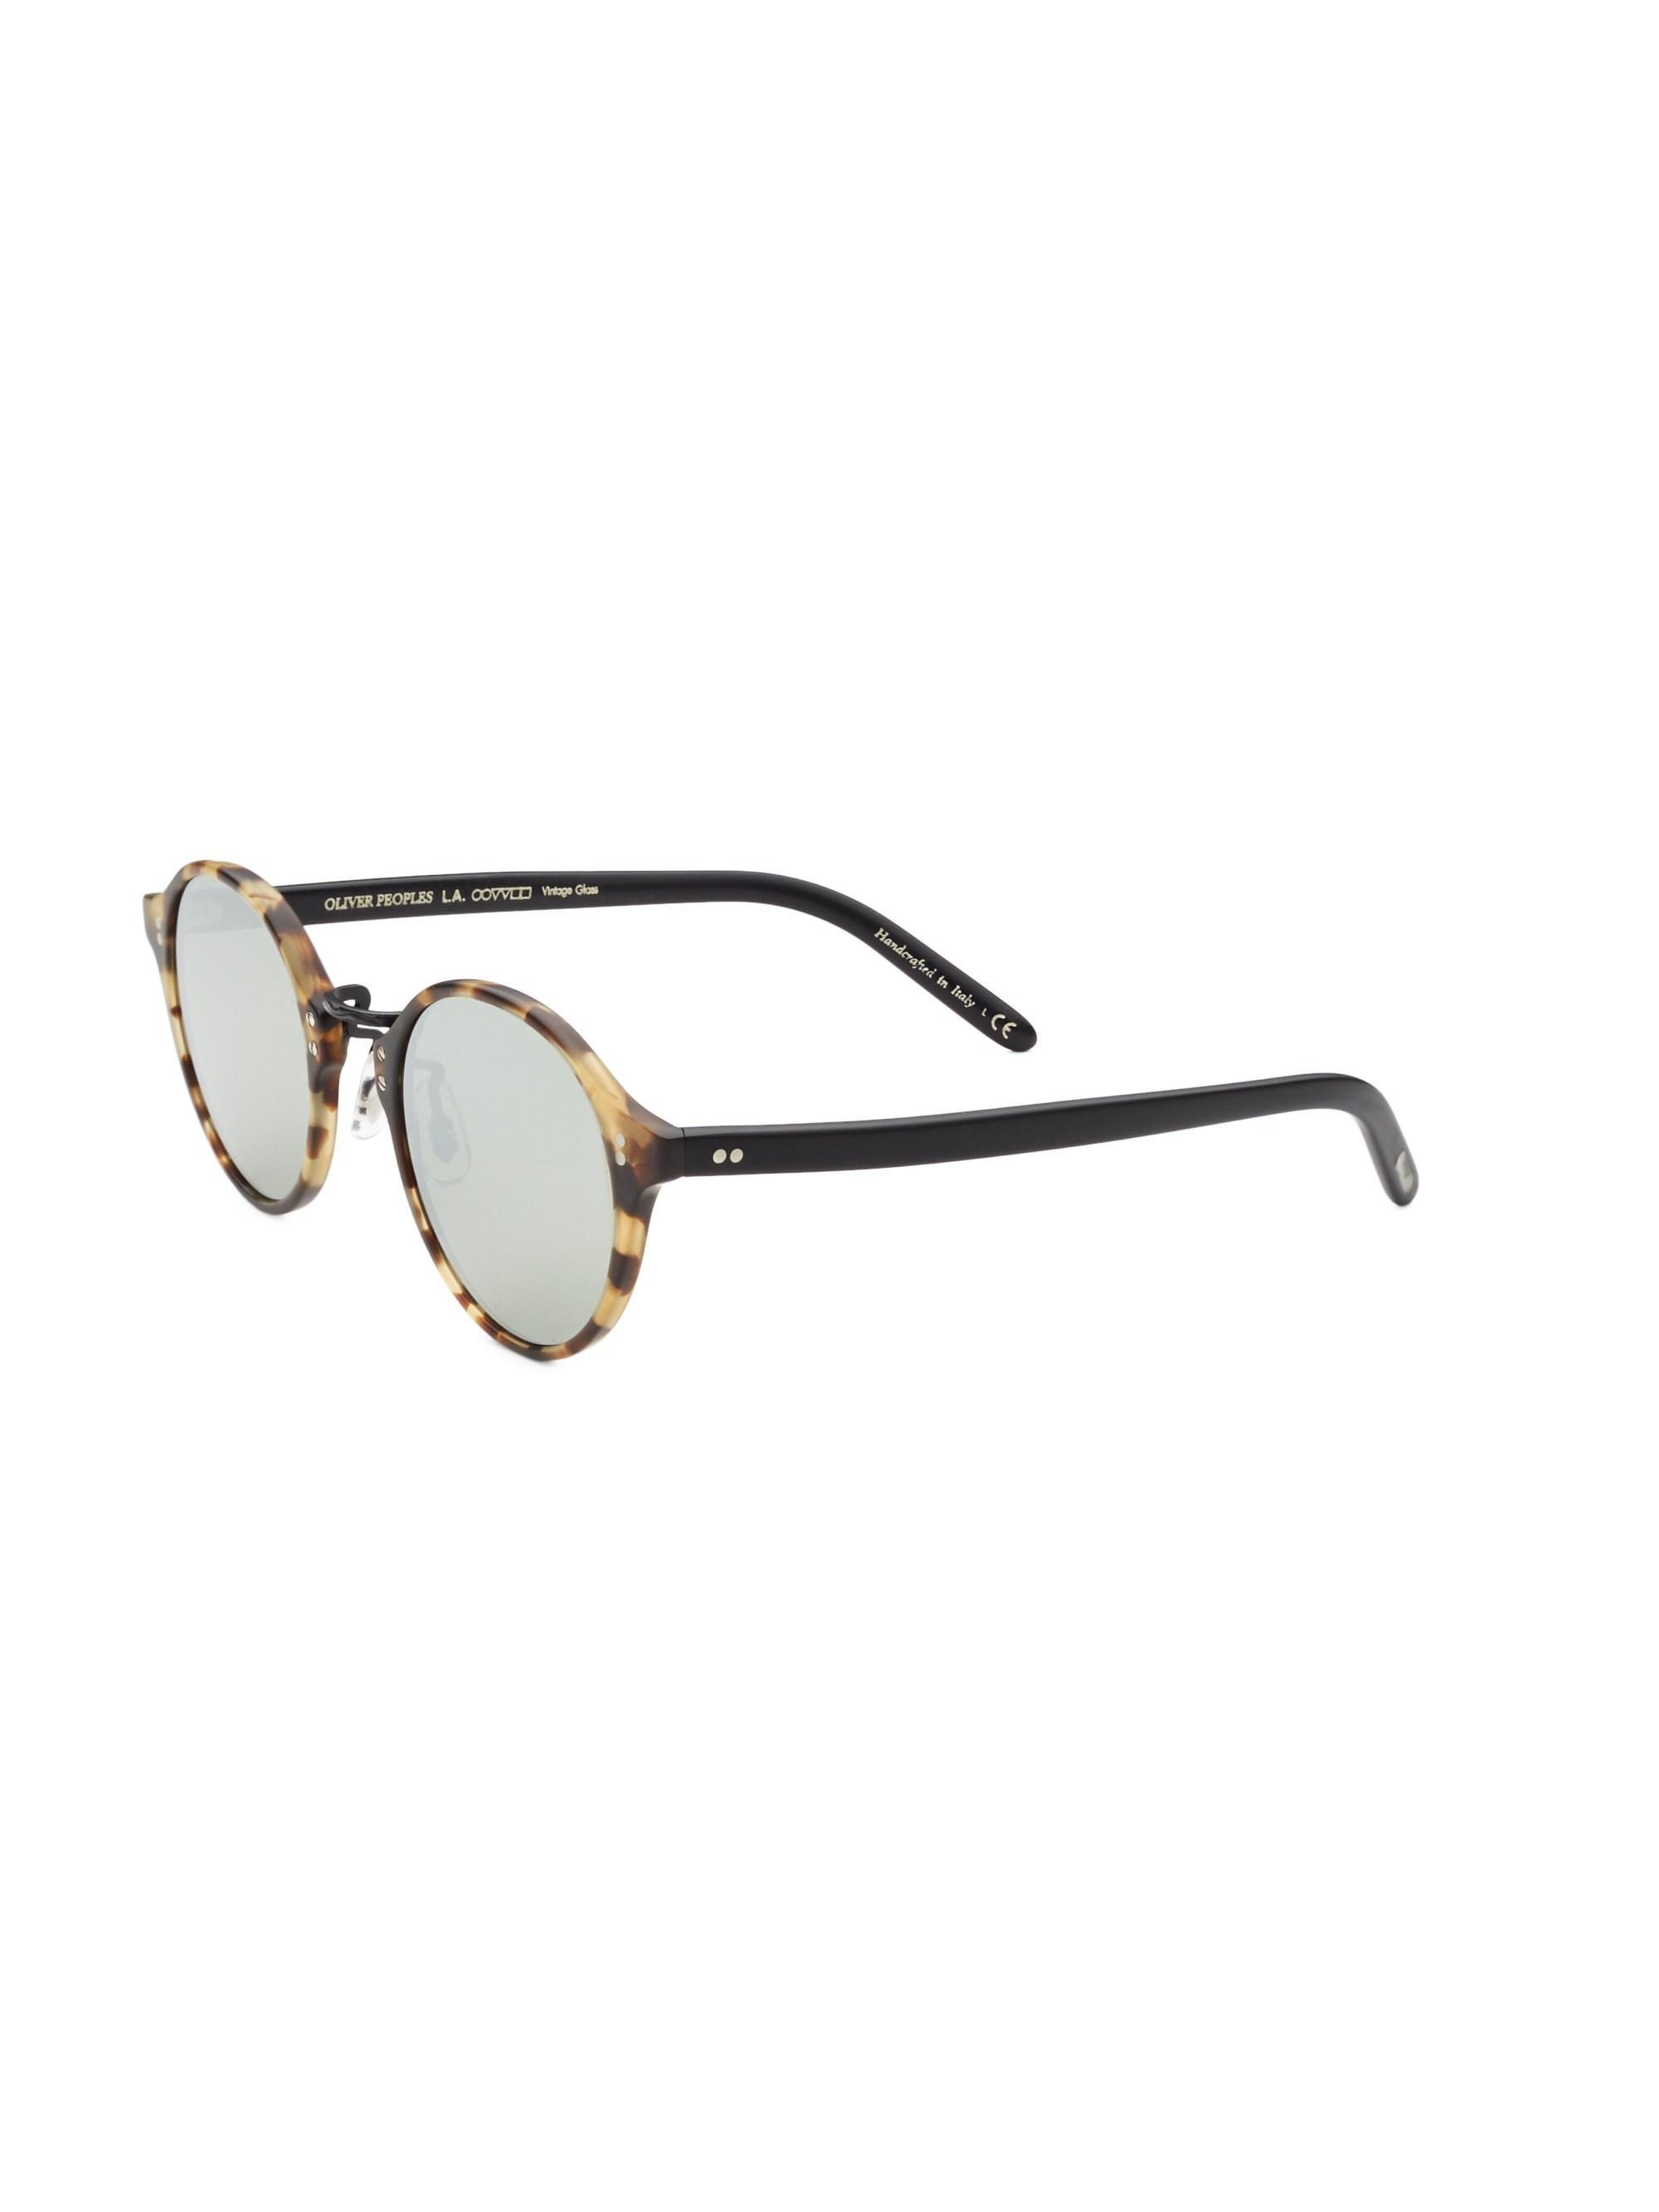 31ff5d5d45 Oliver Peoples - Men s Op-1955 48mm Round Sunglasses - Dark Brown for Men  -. View fullscreen